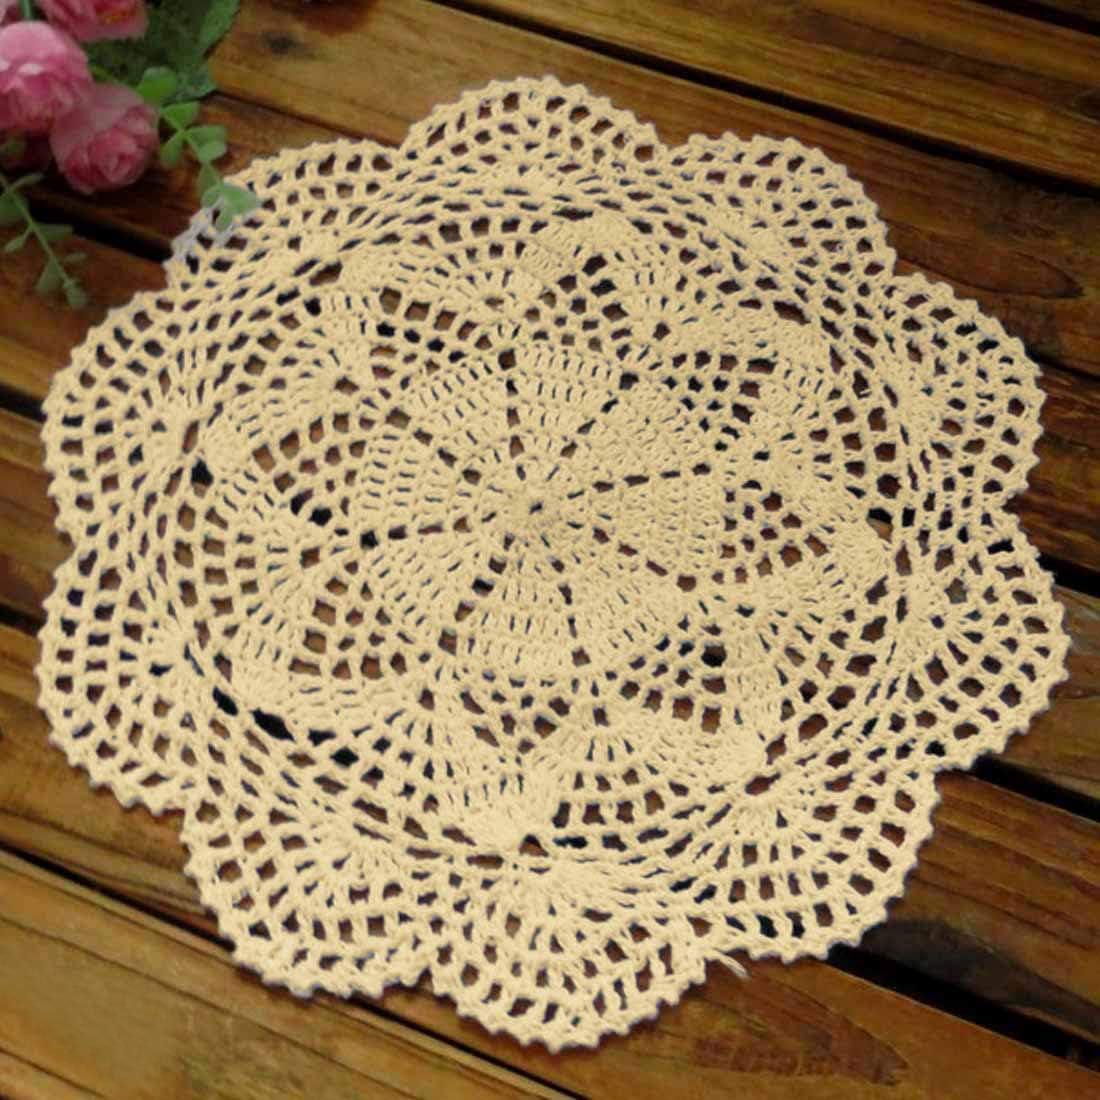 kilofly Crochet Cotton Lace Table Placemats Doilies Value Pack, 4pc, Roma, Beige, 10 inch